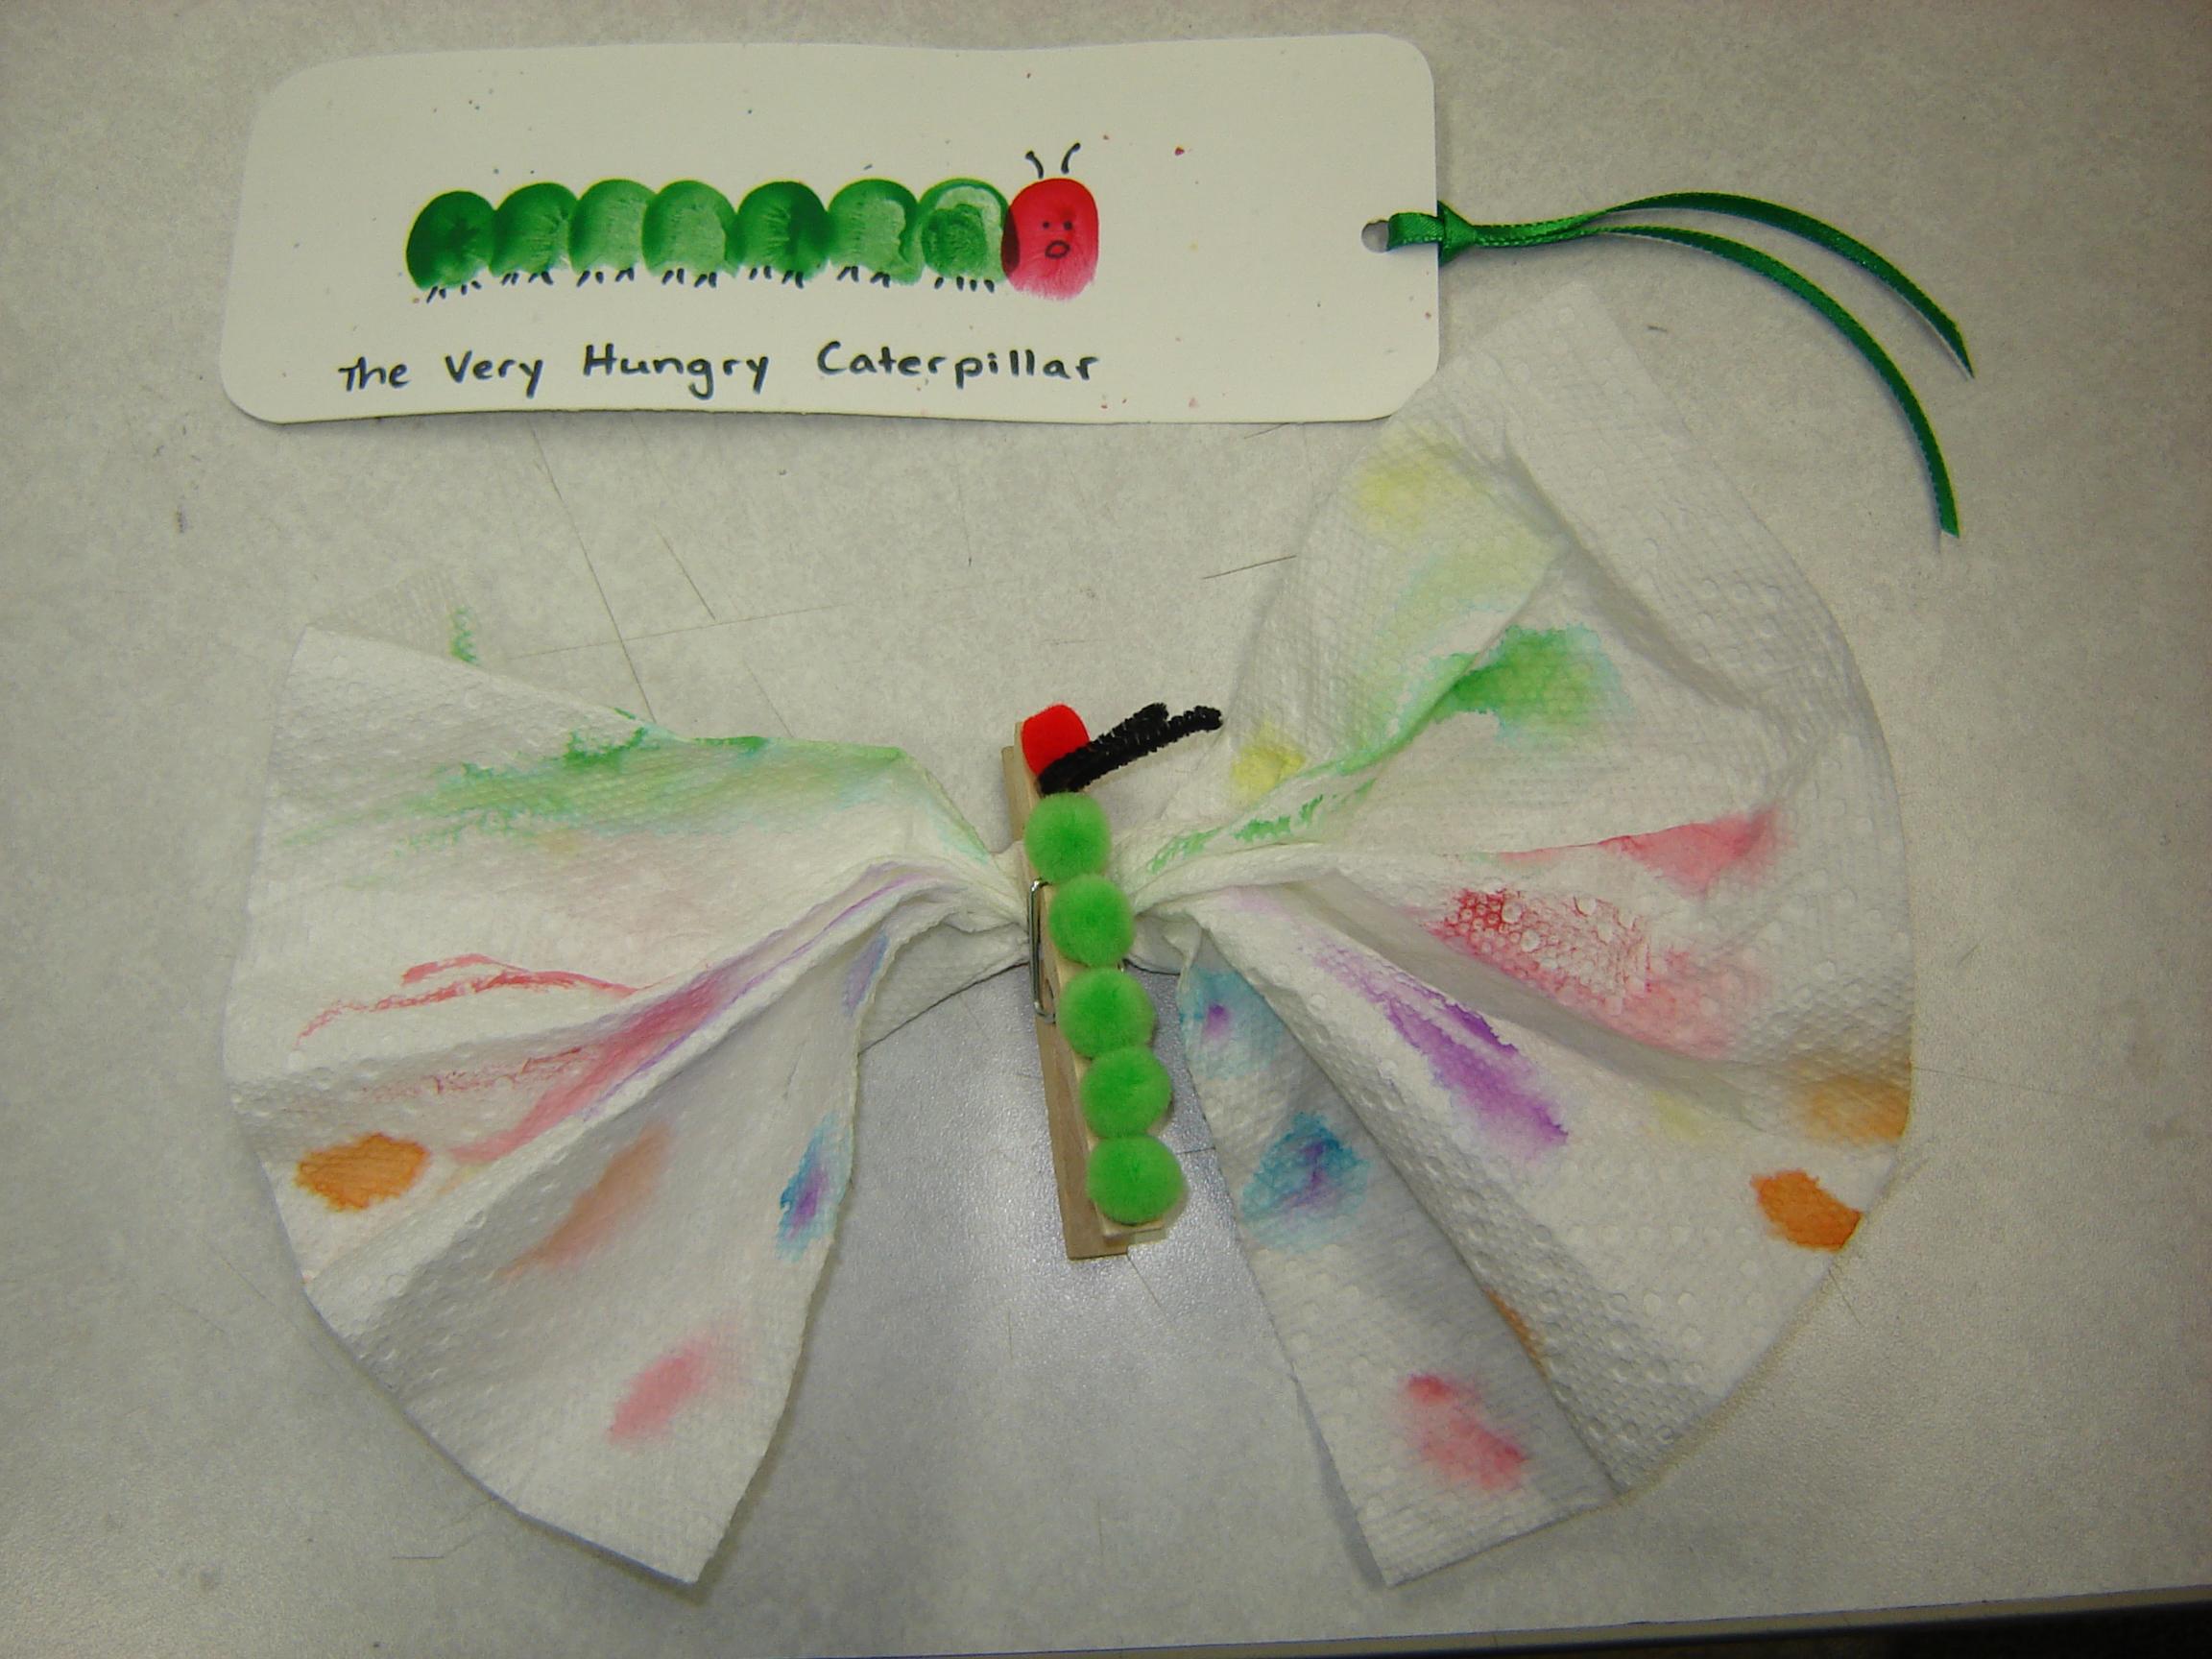 Preschool programs beyond storytime alsc blog for Caterpillar crafts for preschoolers